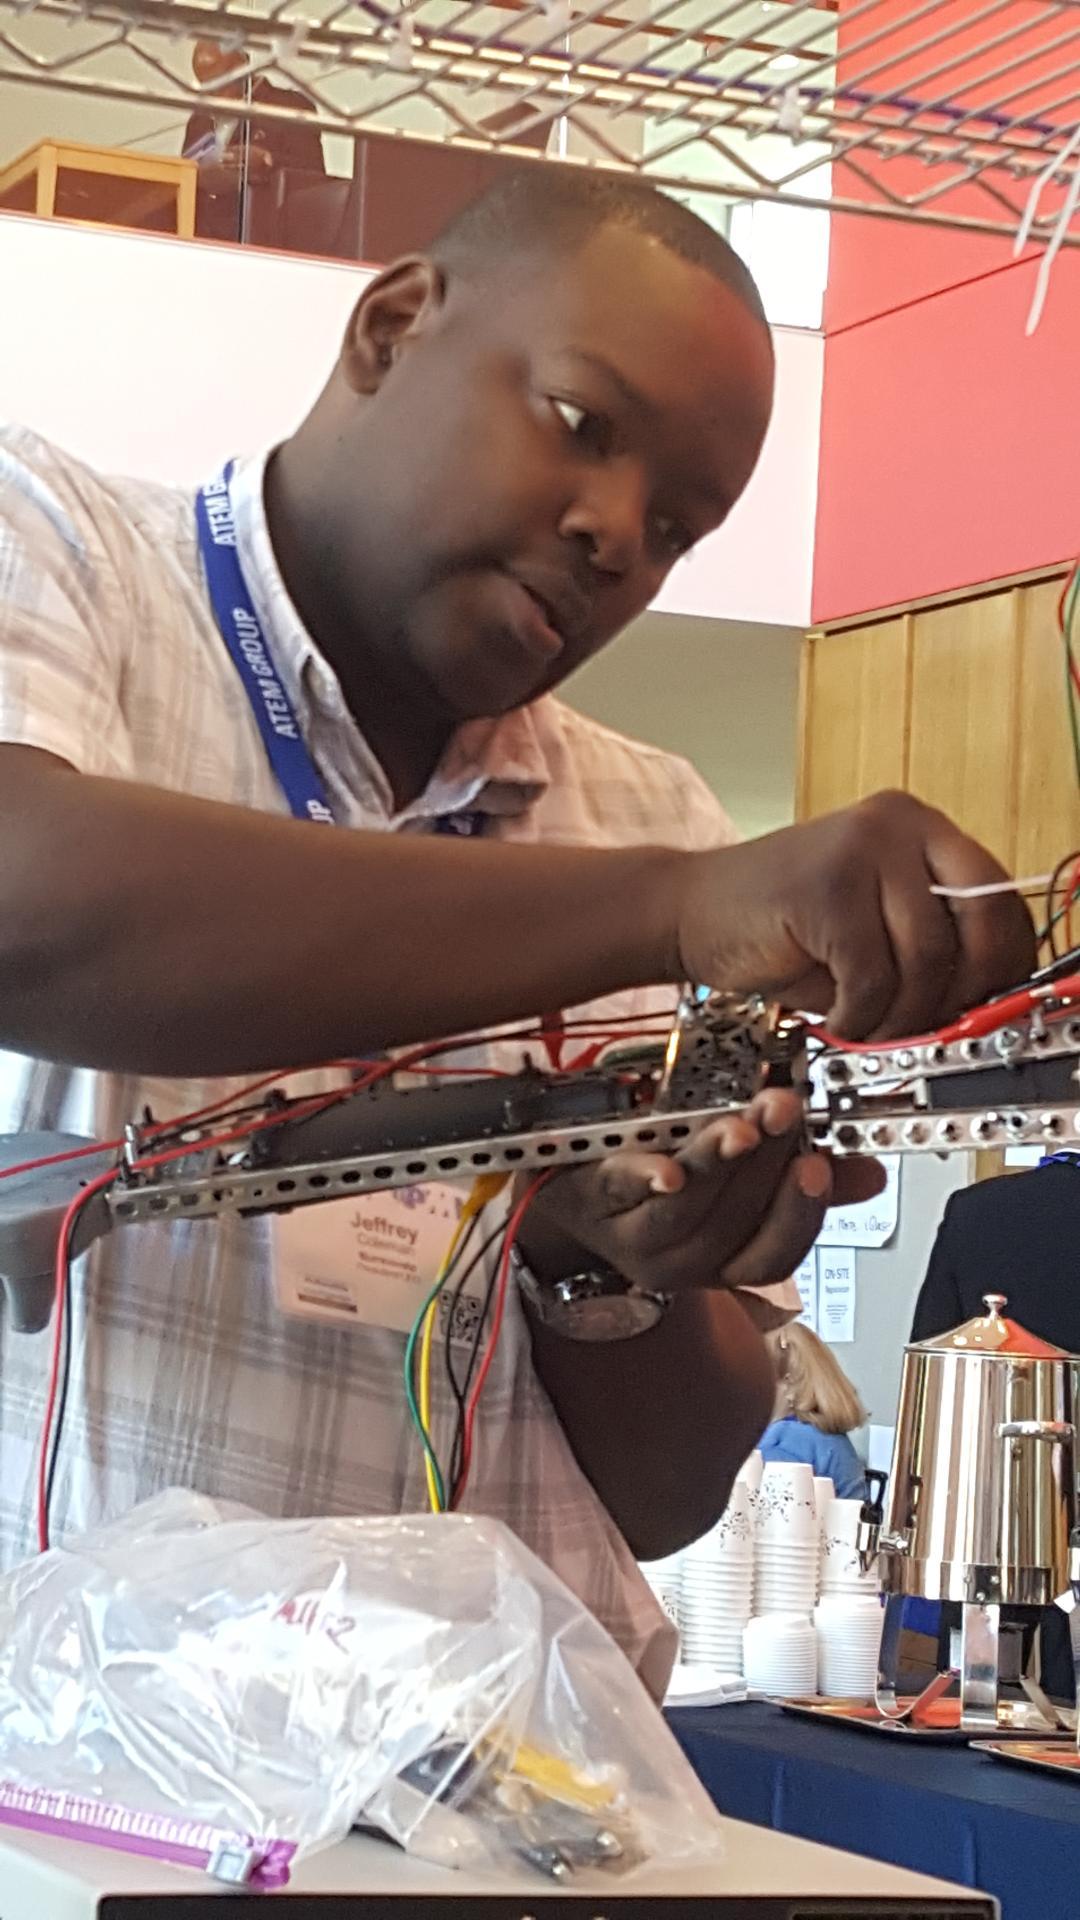 Putting In Work: Assembling Robot Demo at 2016 PMI Symposium